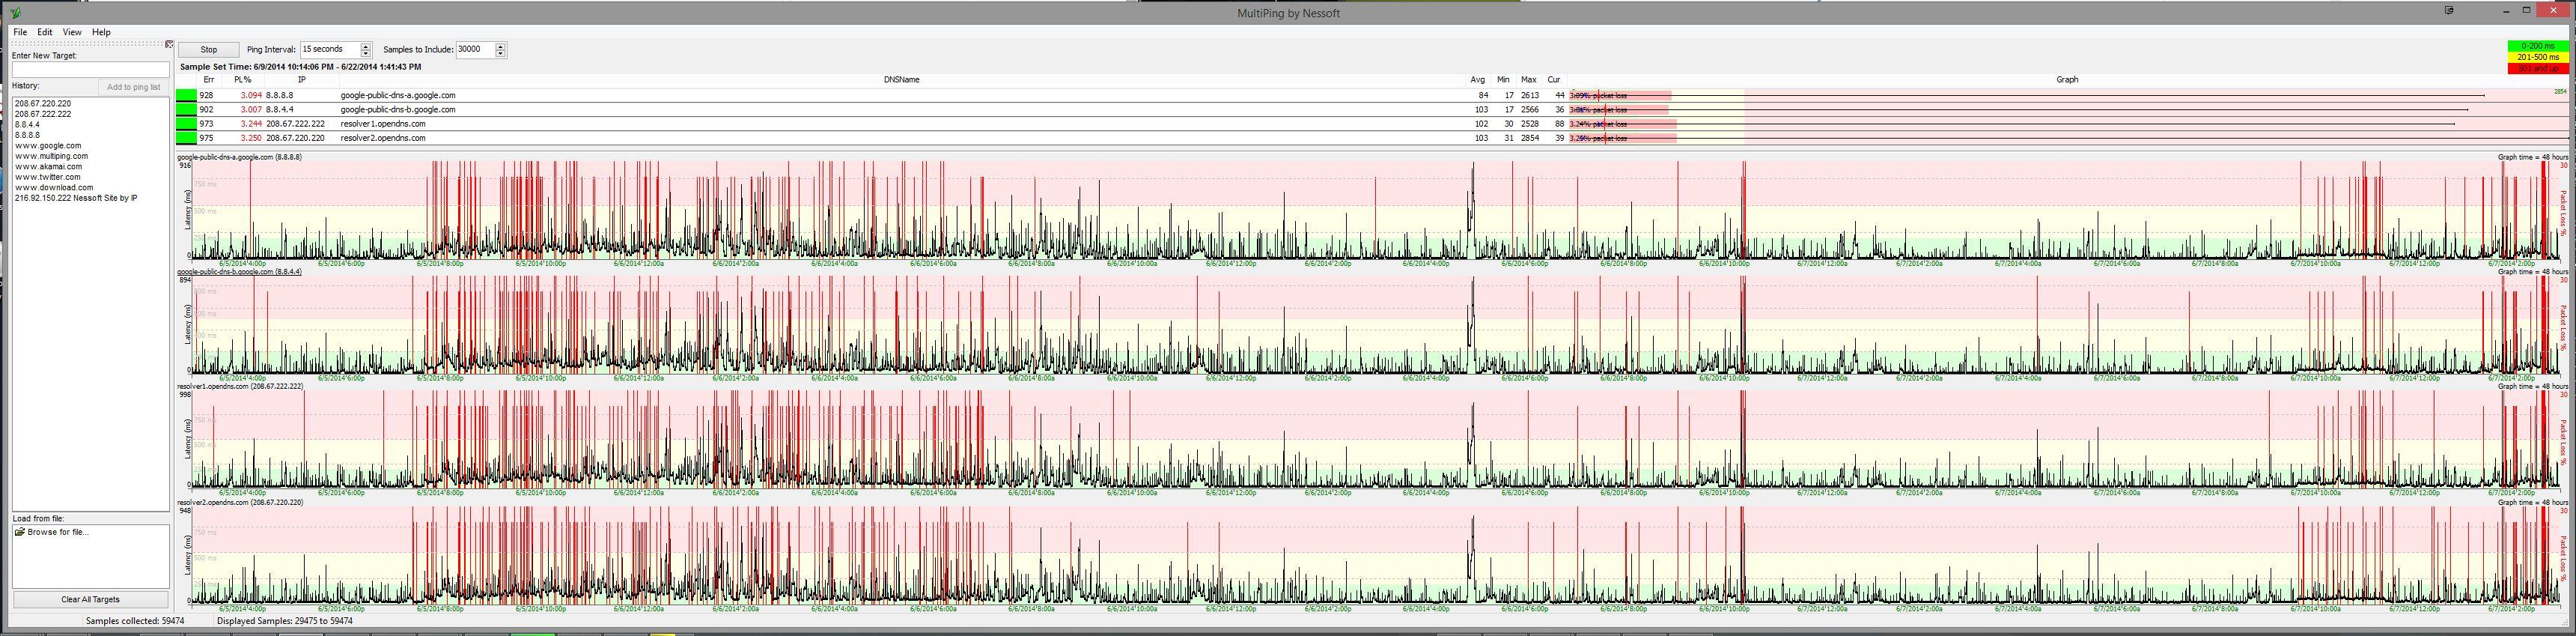 Comcast-Multiping 6.JPG